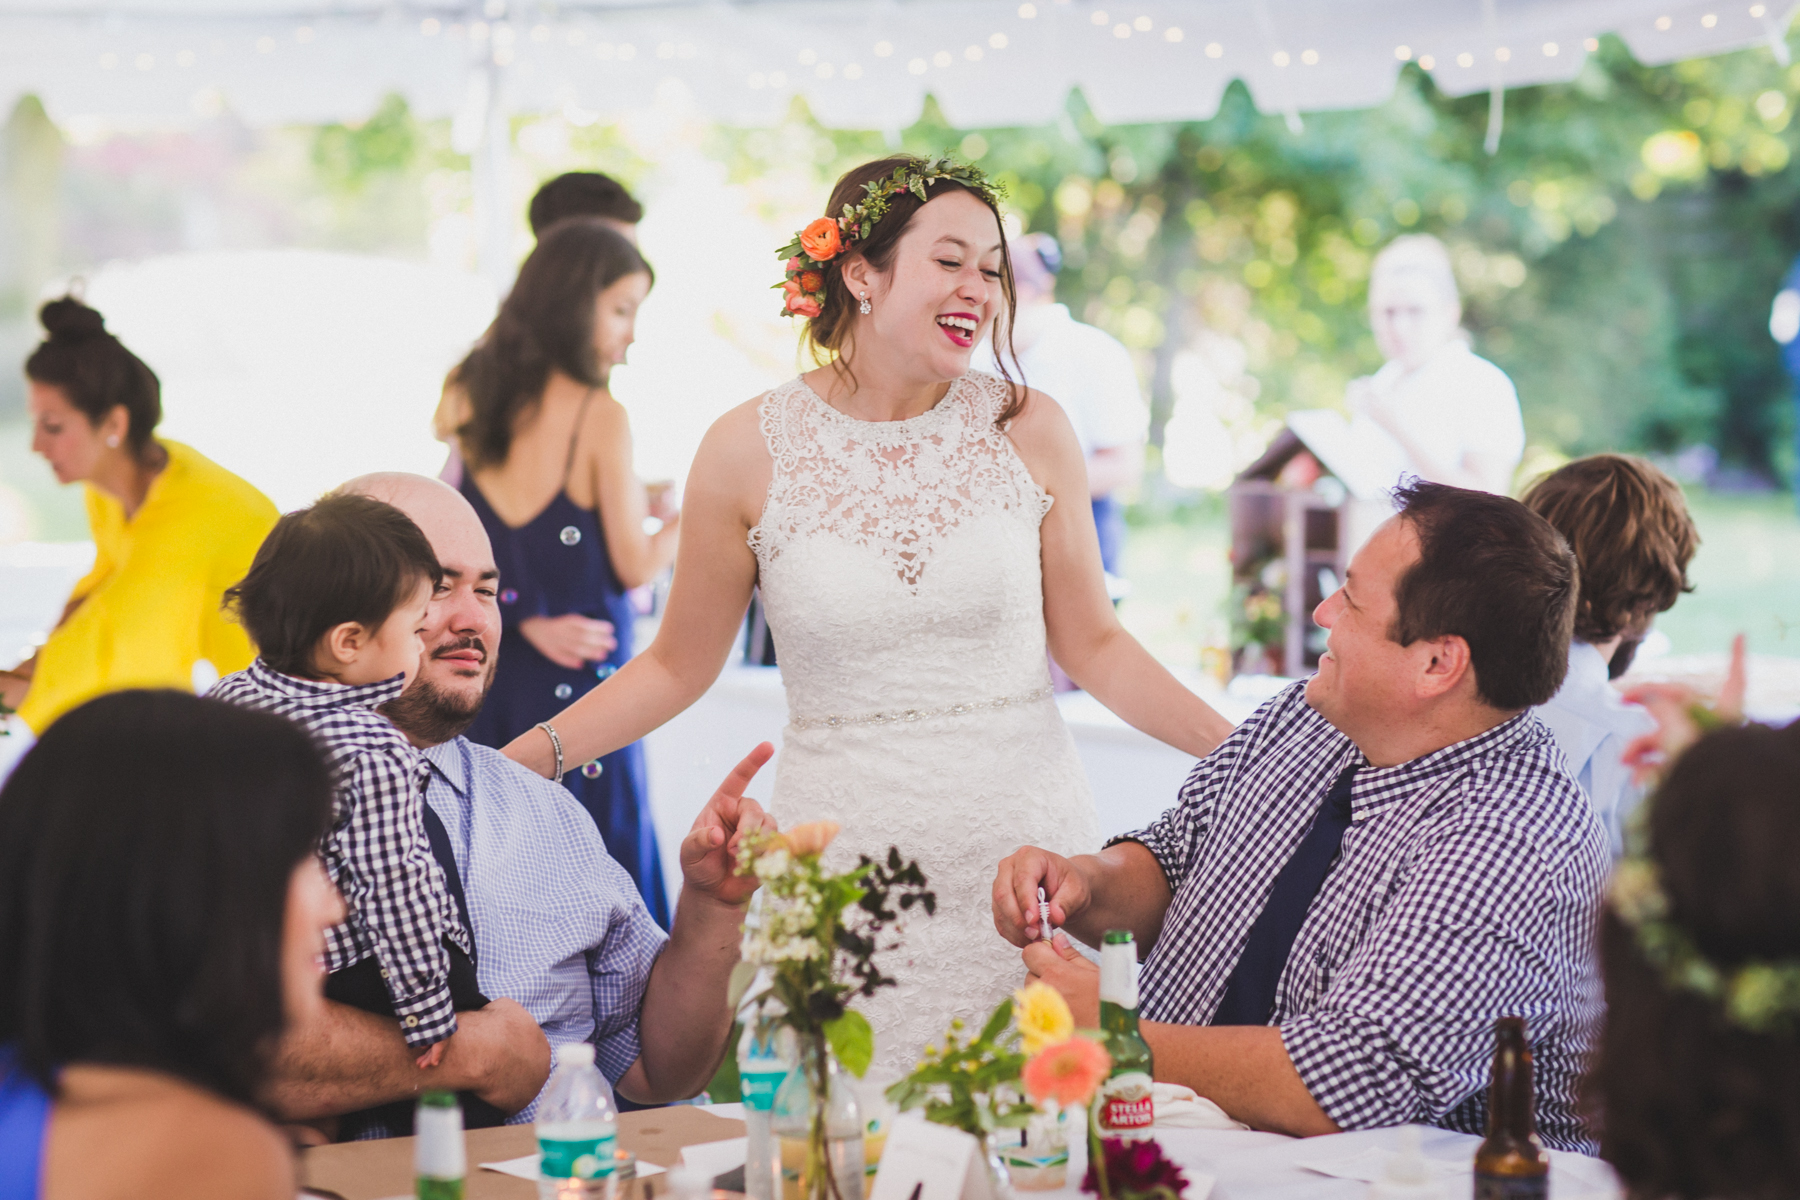 Long-Island-Documentary-Wedding-Photography-Summer-Tent-Wedding-in-New-York-111.jpg